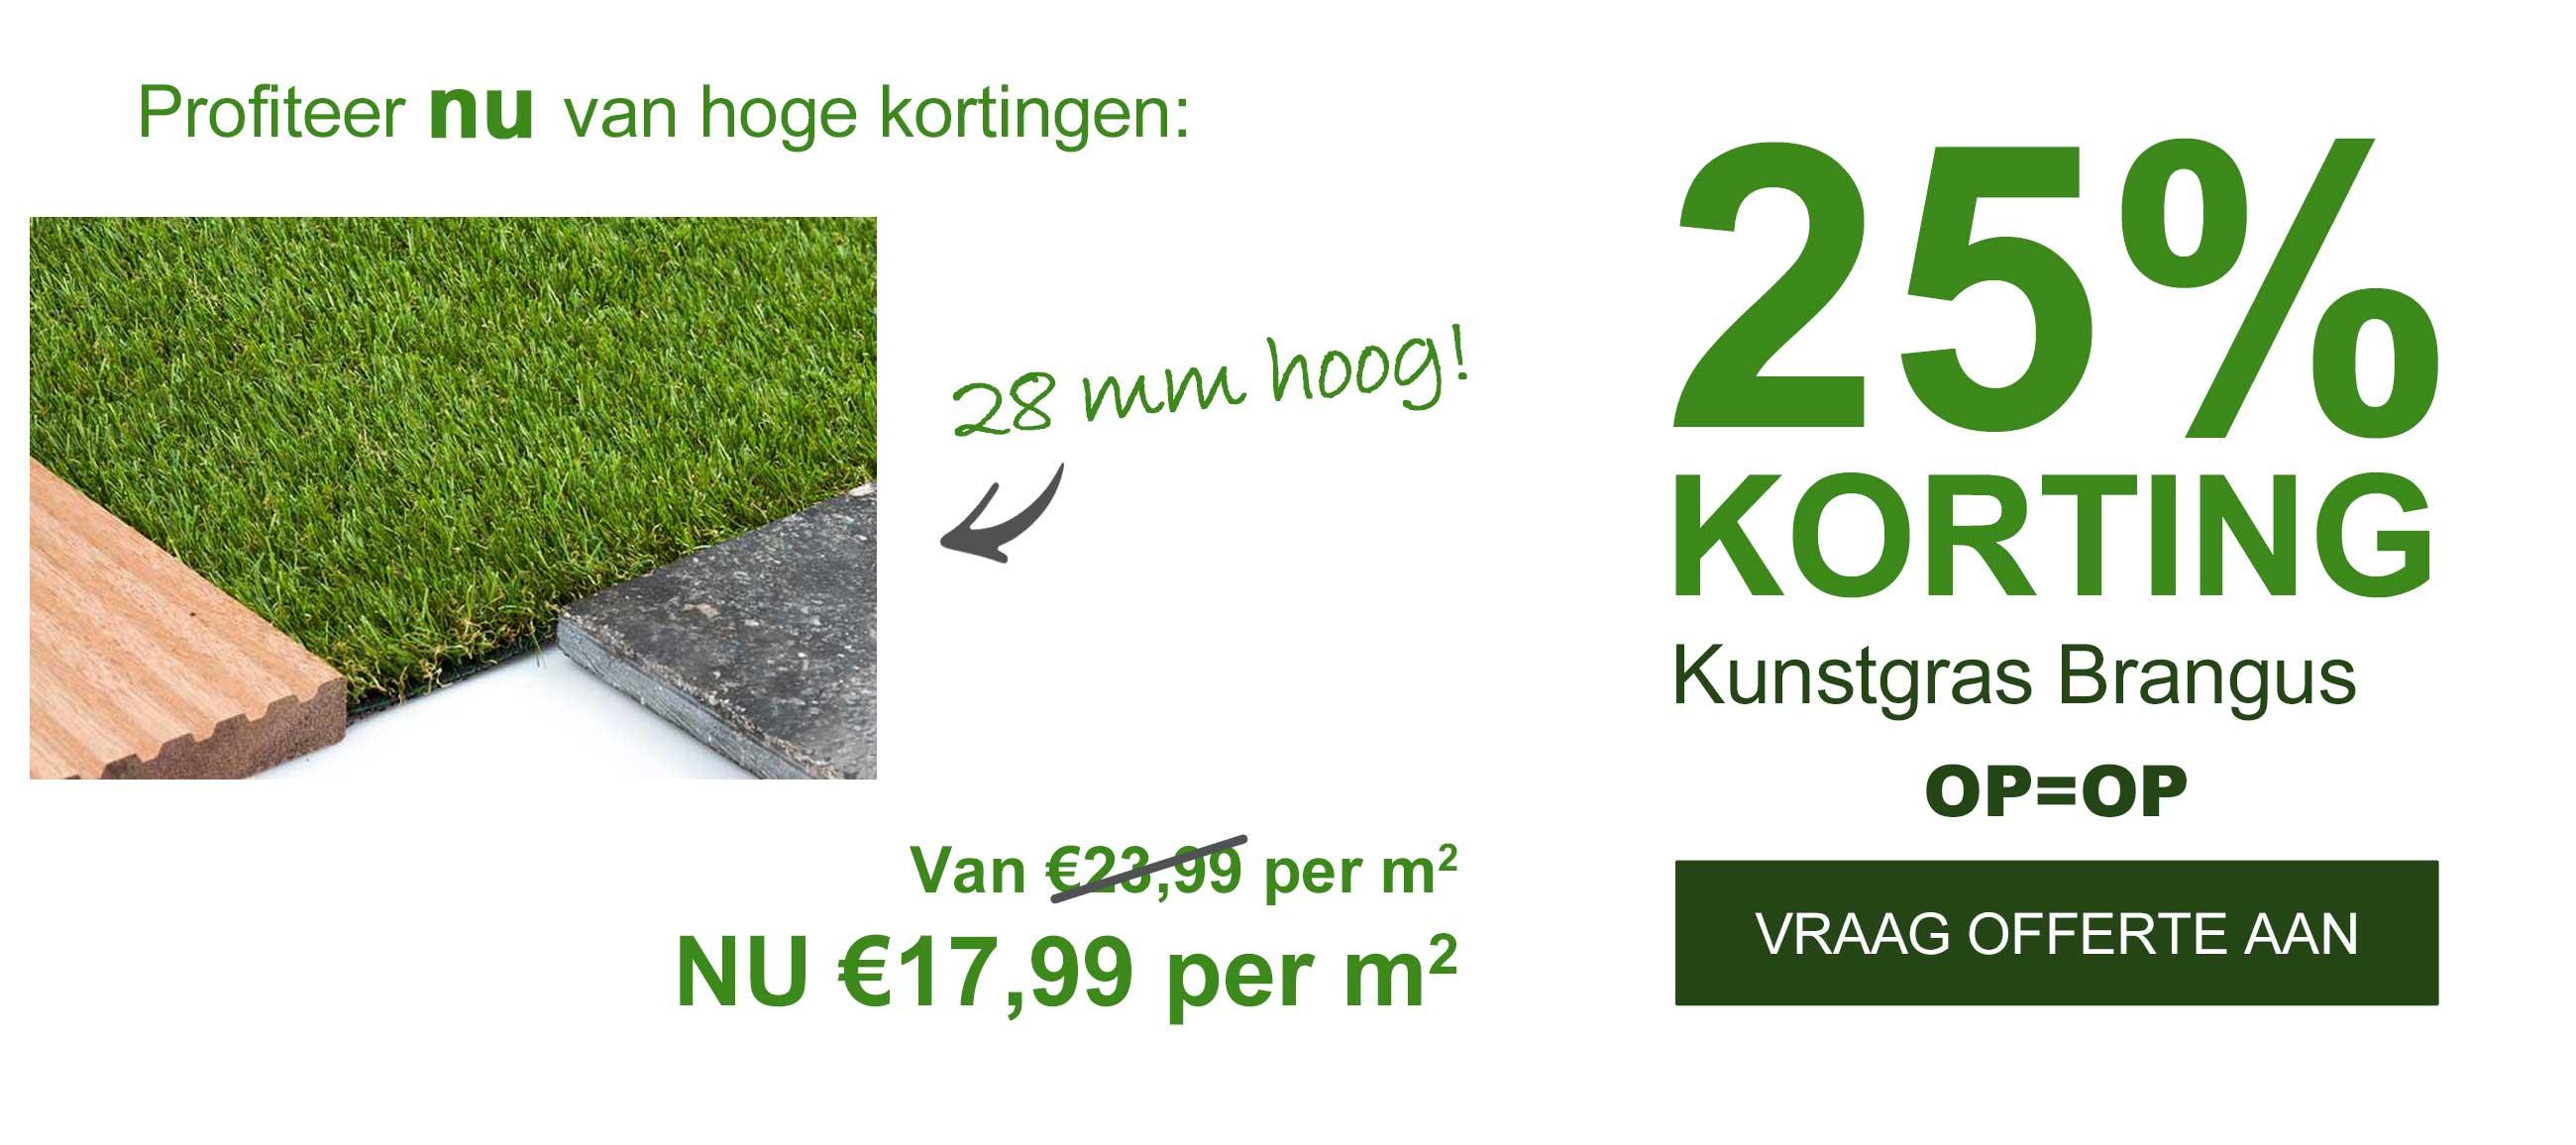 Opruiming!! 25% Korting Op Kunstgras Brangus